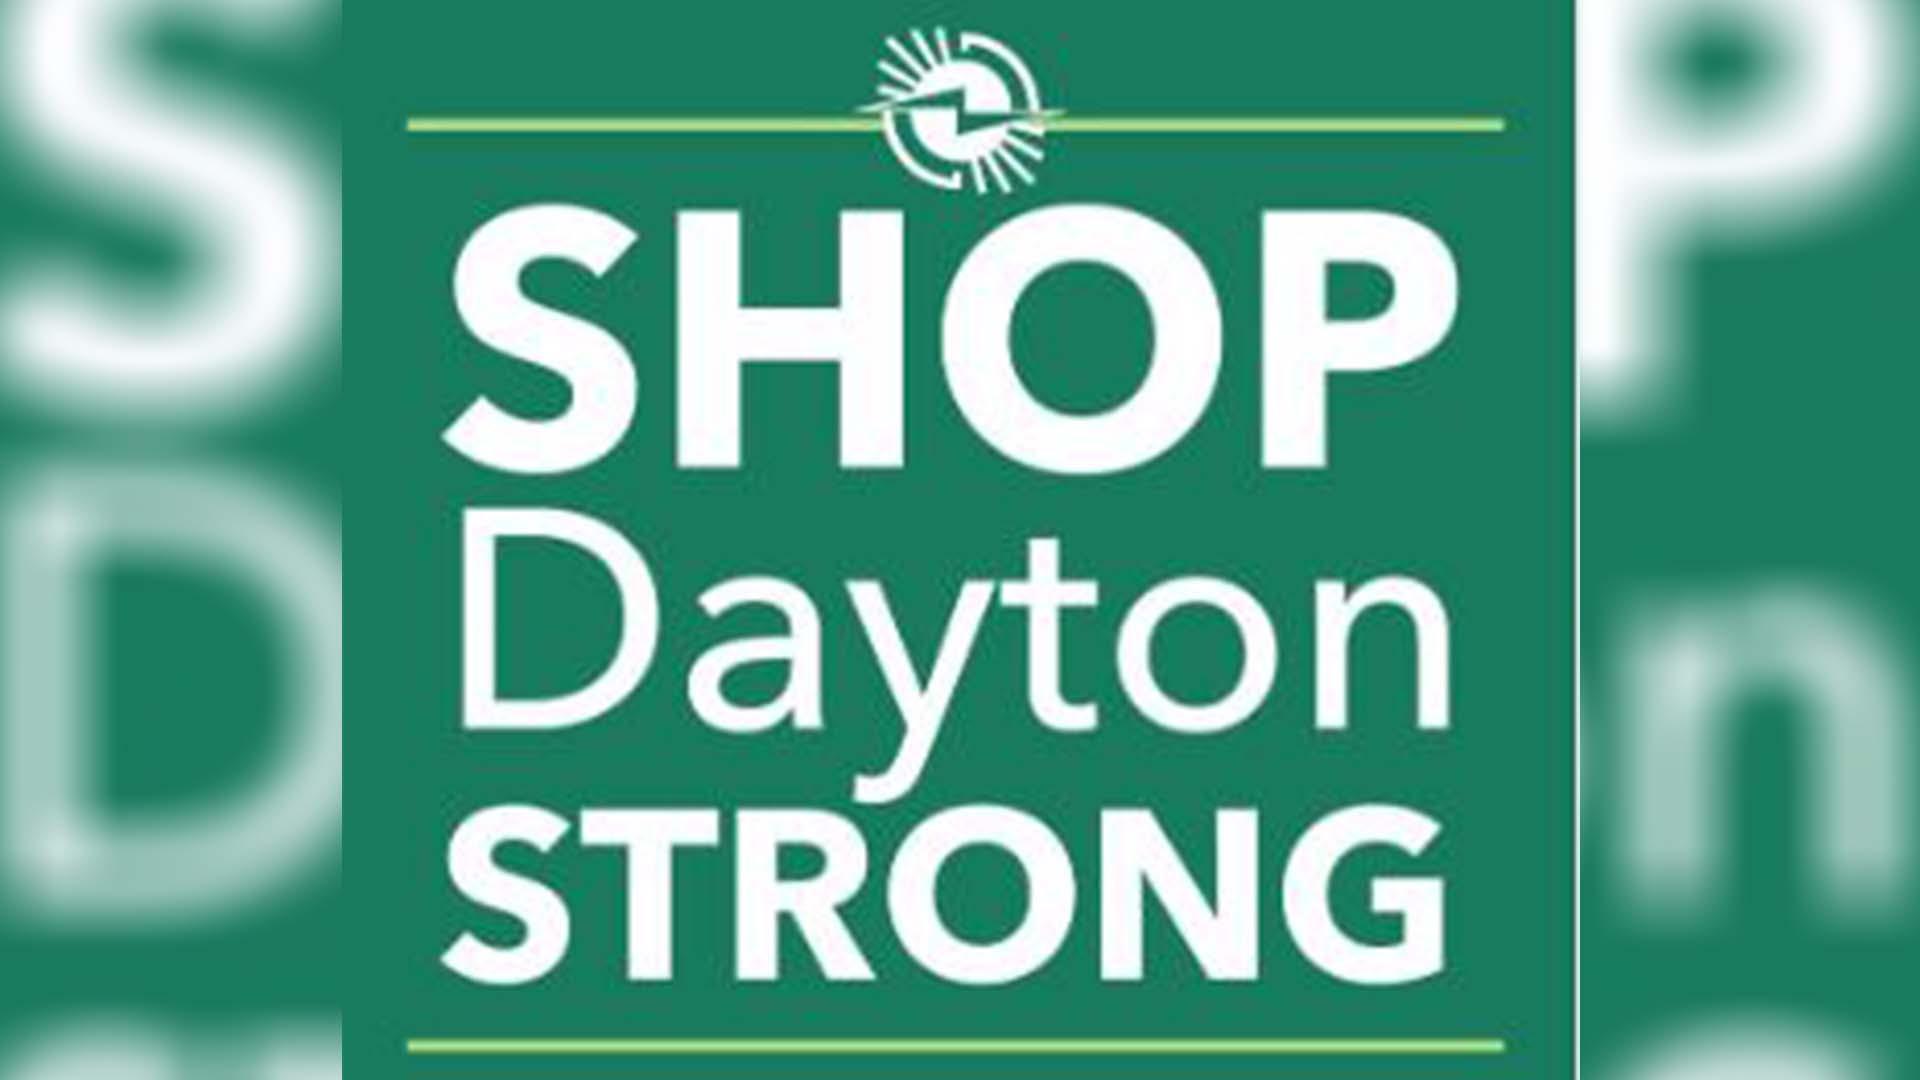 Shop Dayton Strong